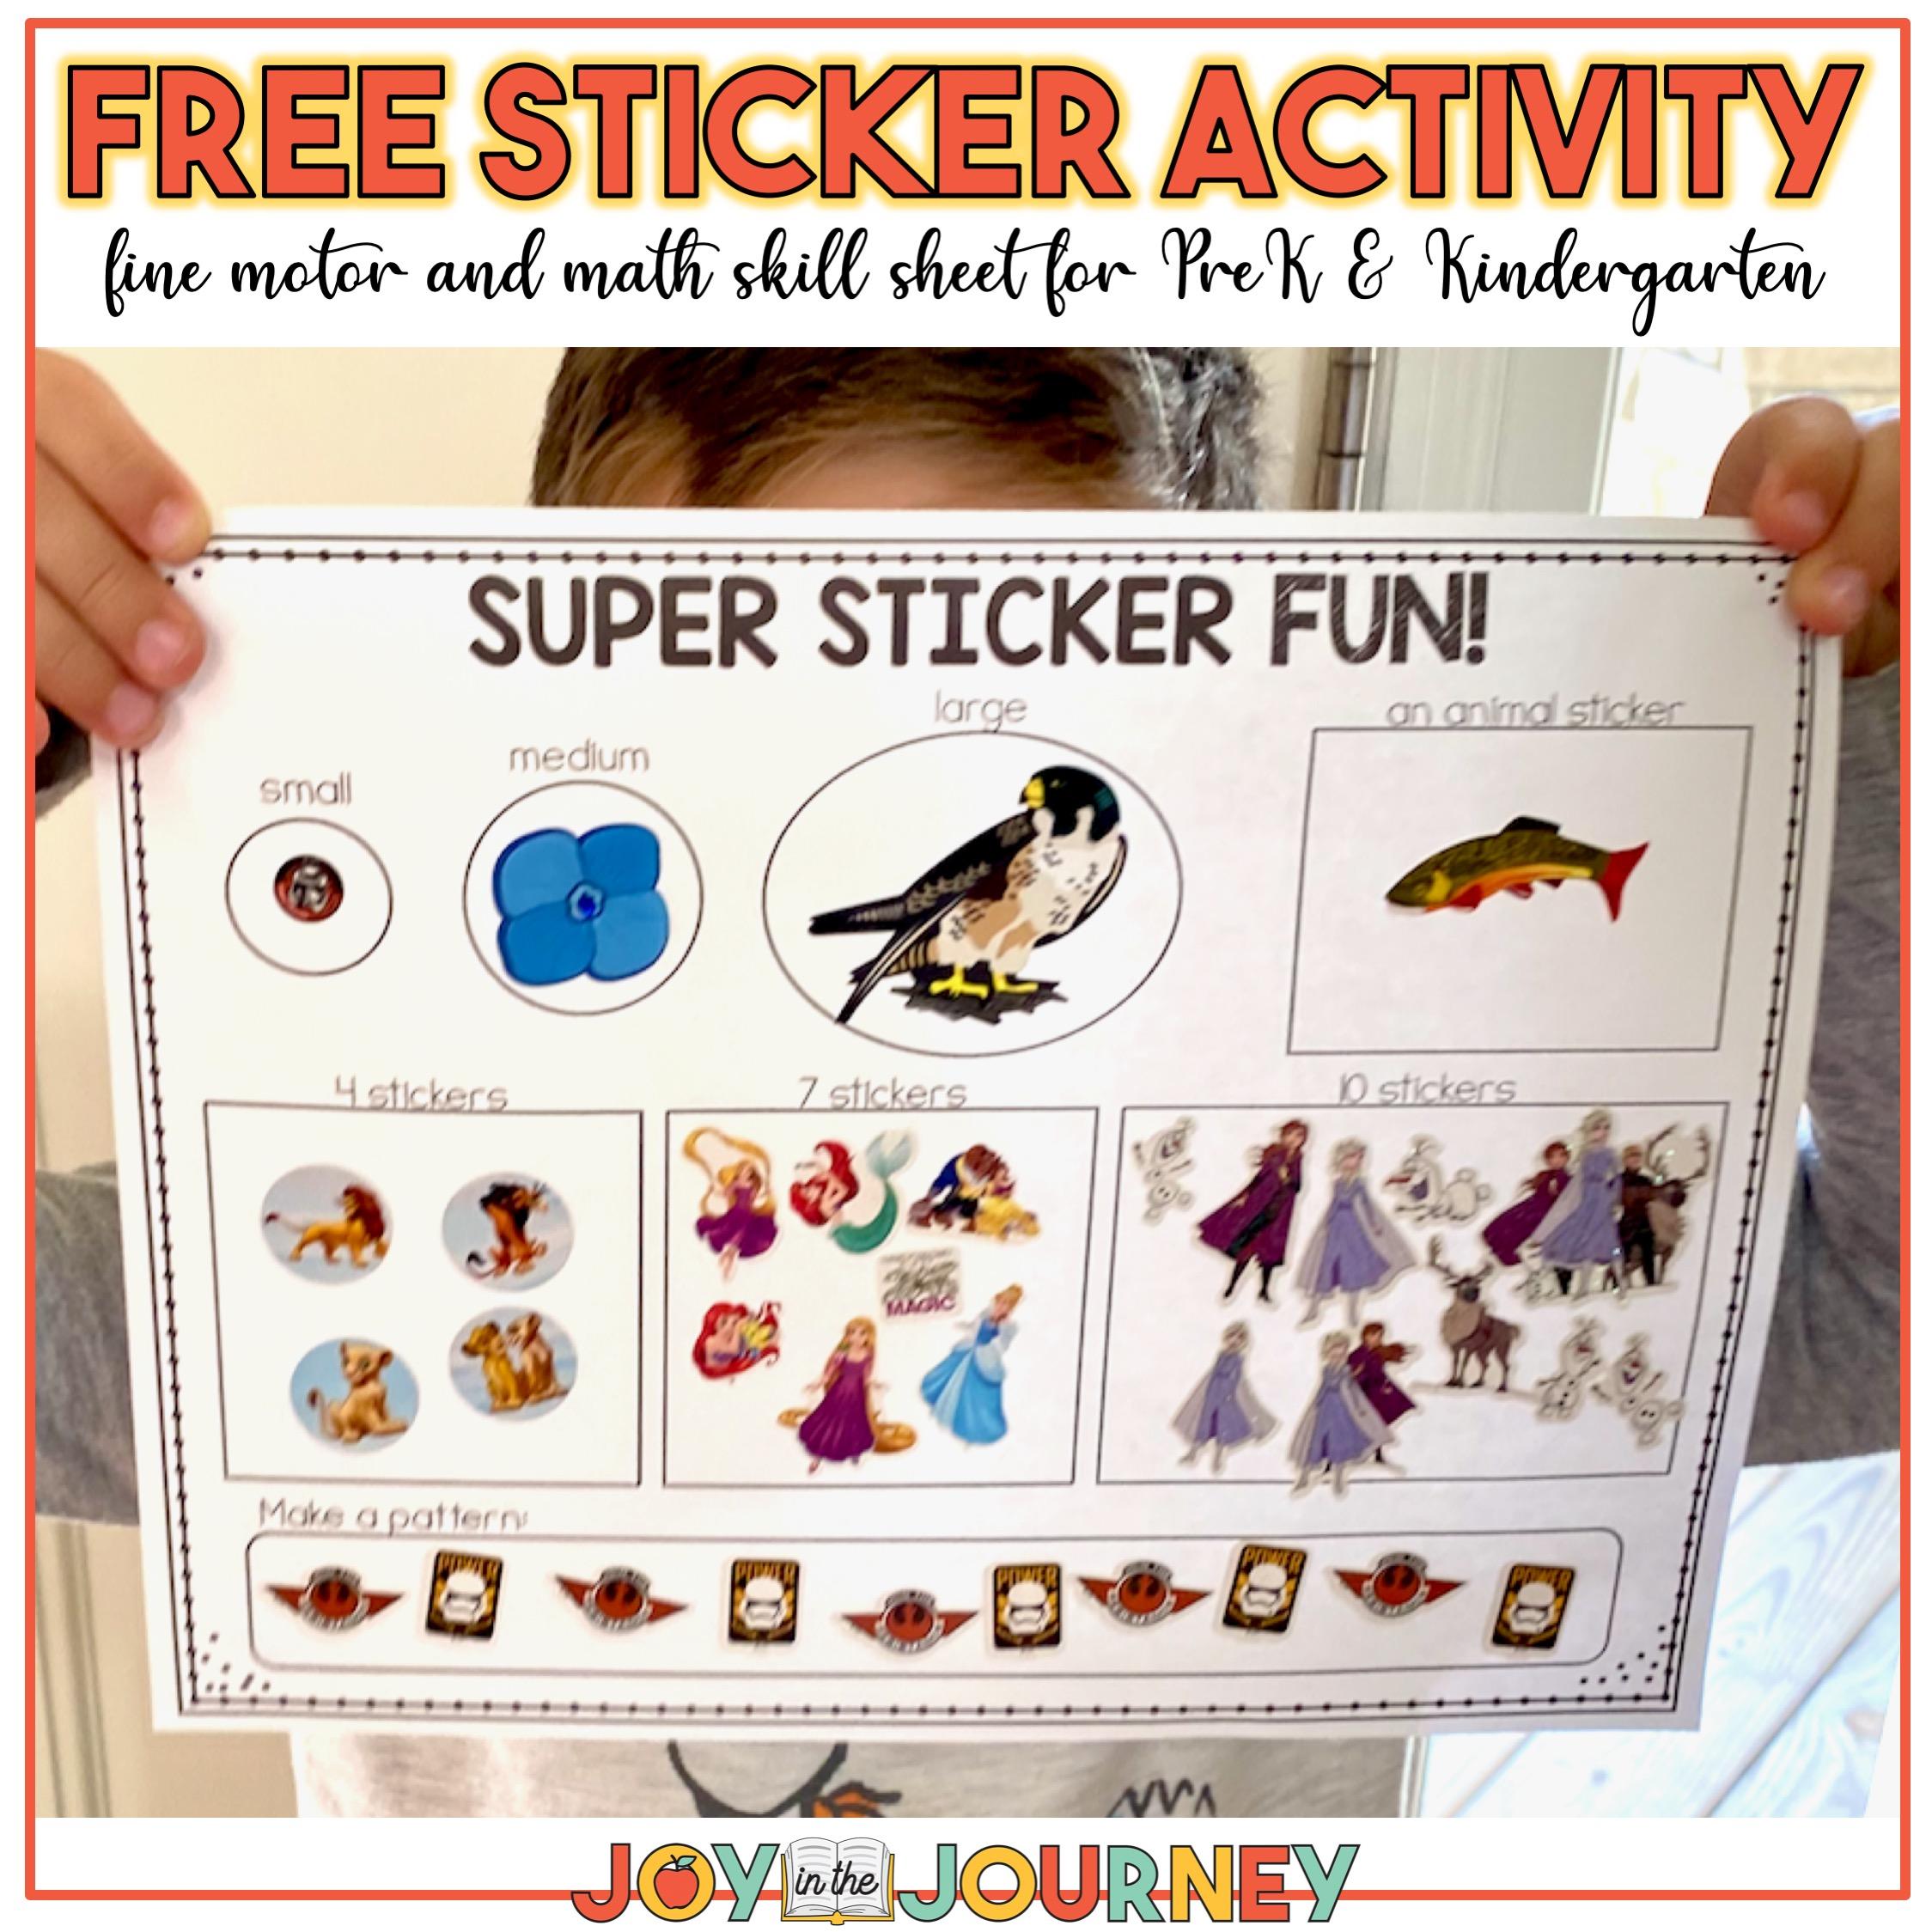 FREE sticker activity page